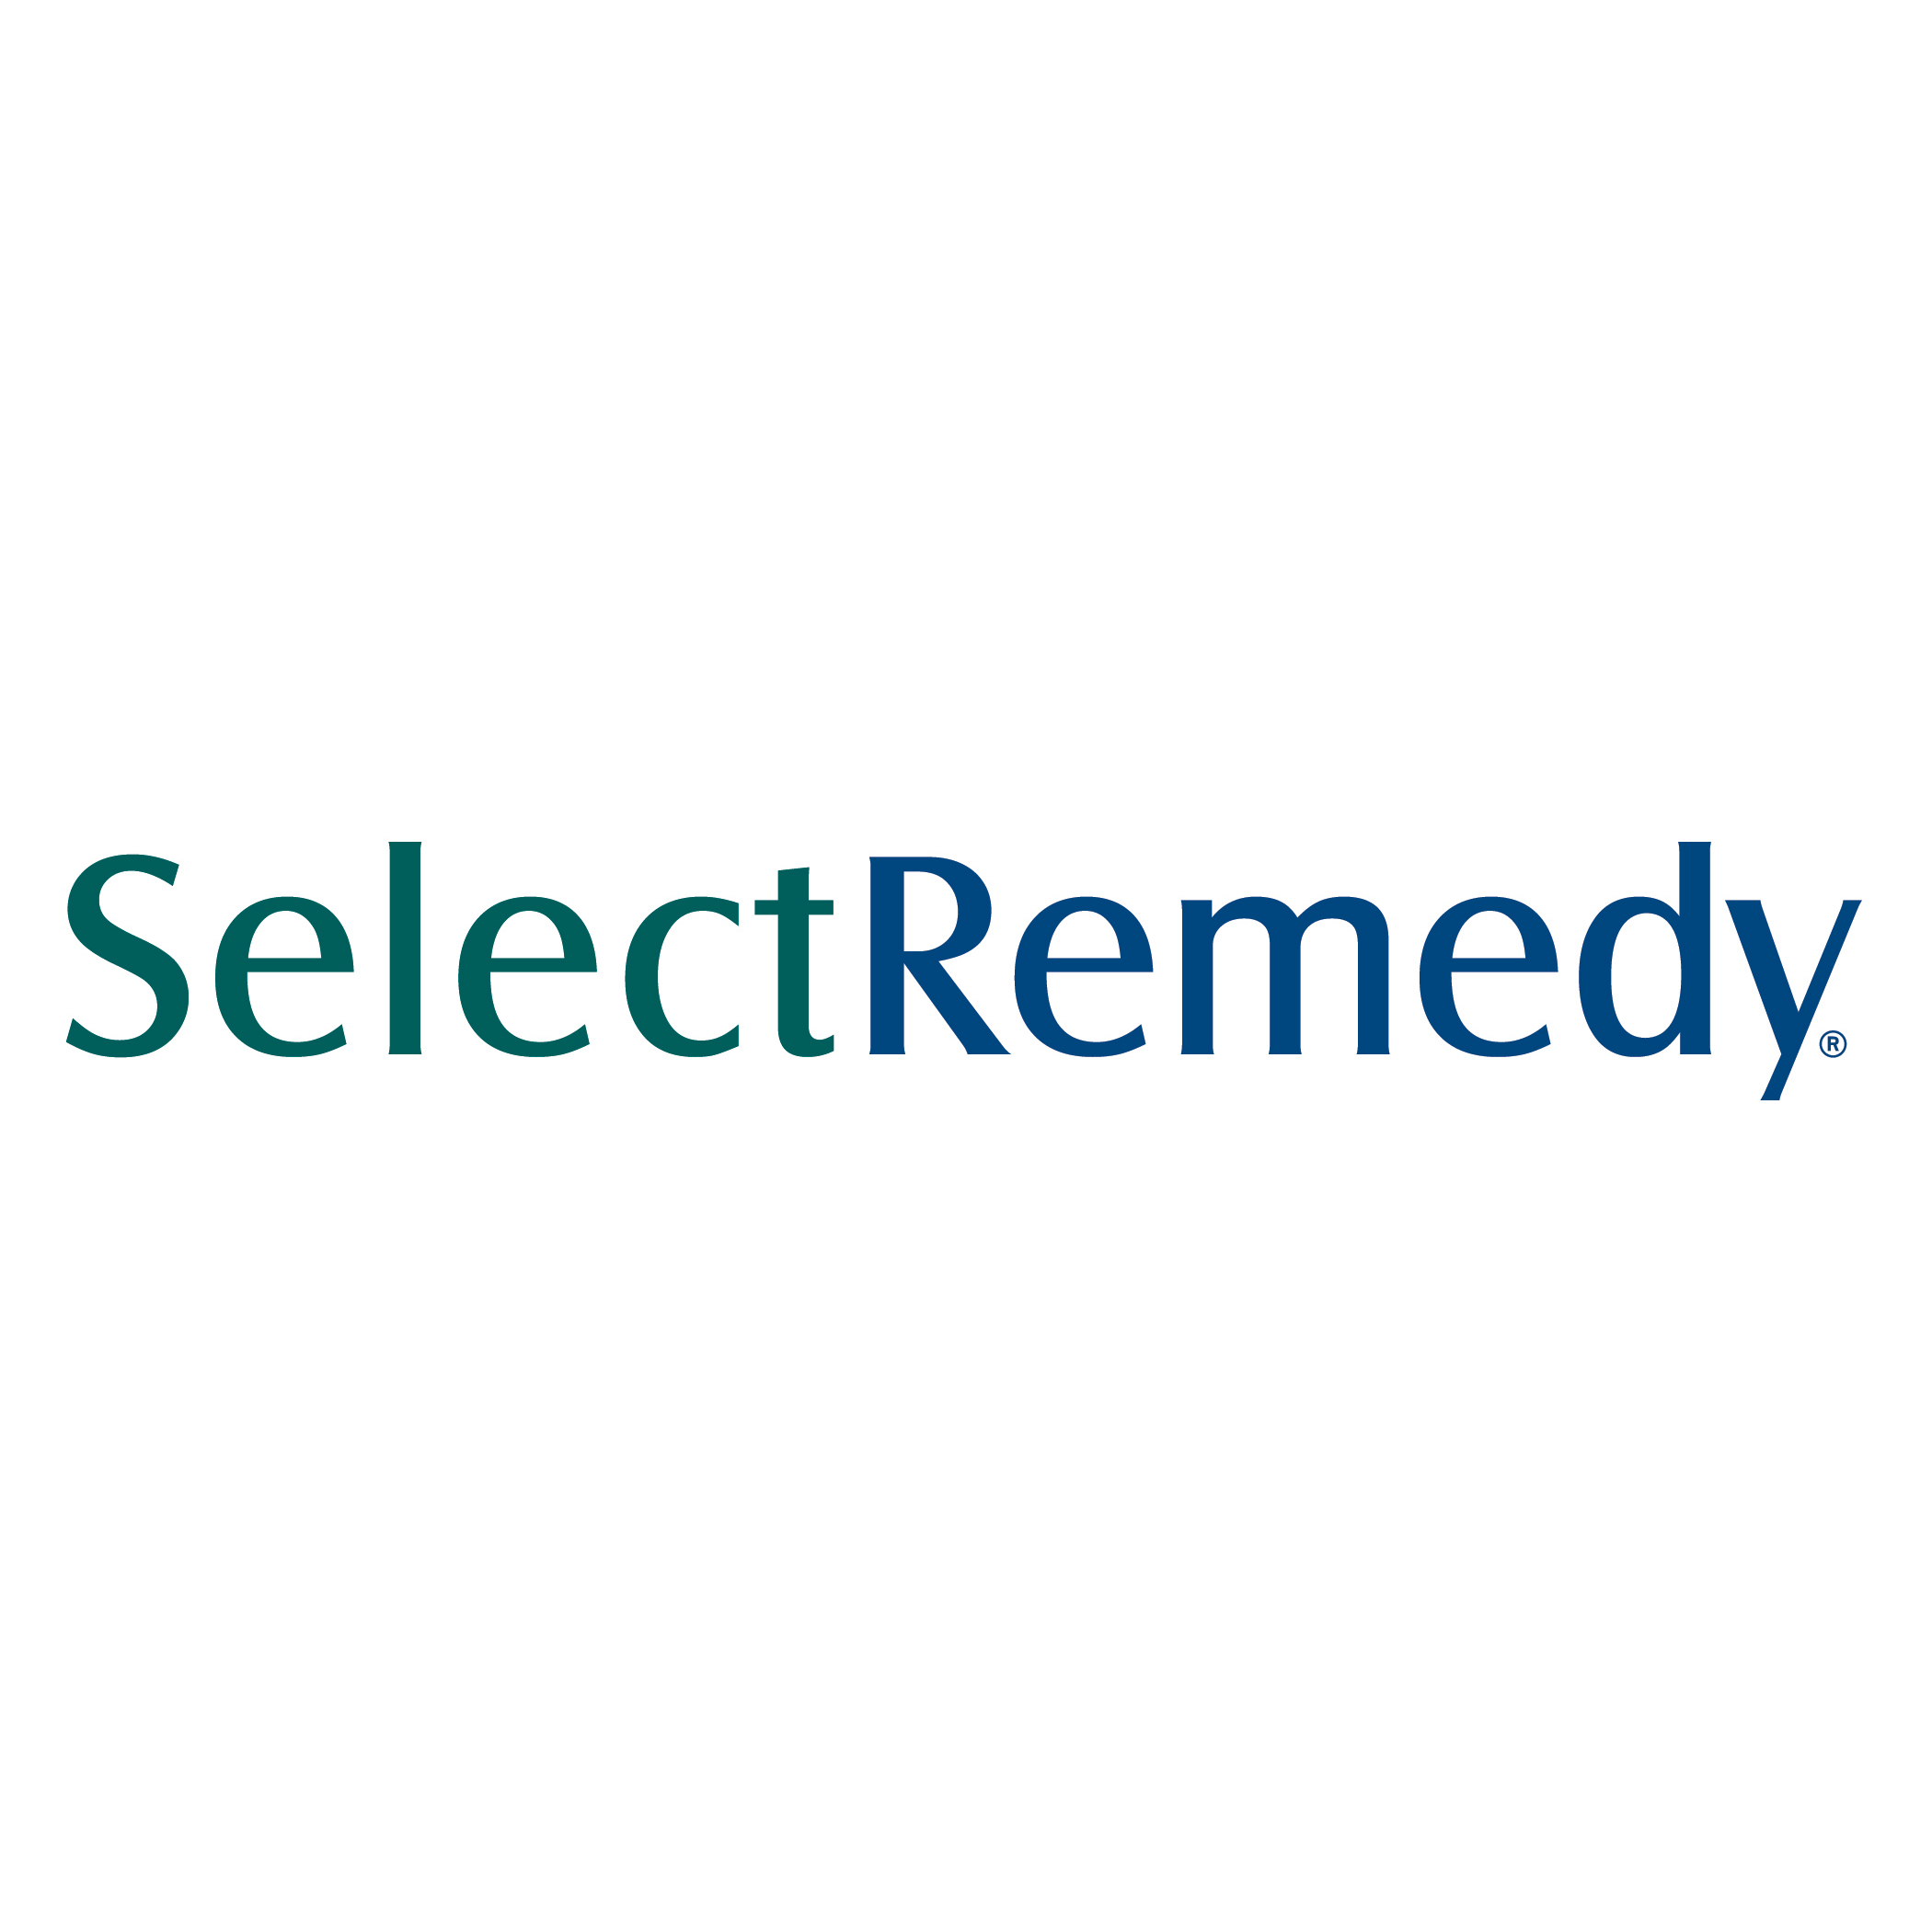 SelectRemedy - Closed